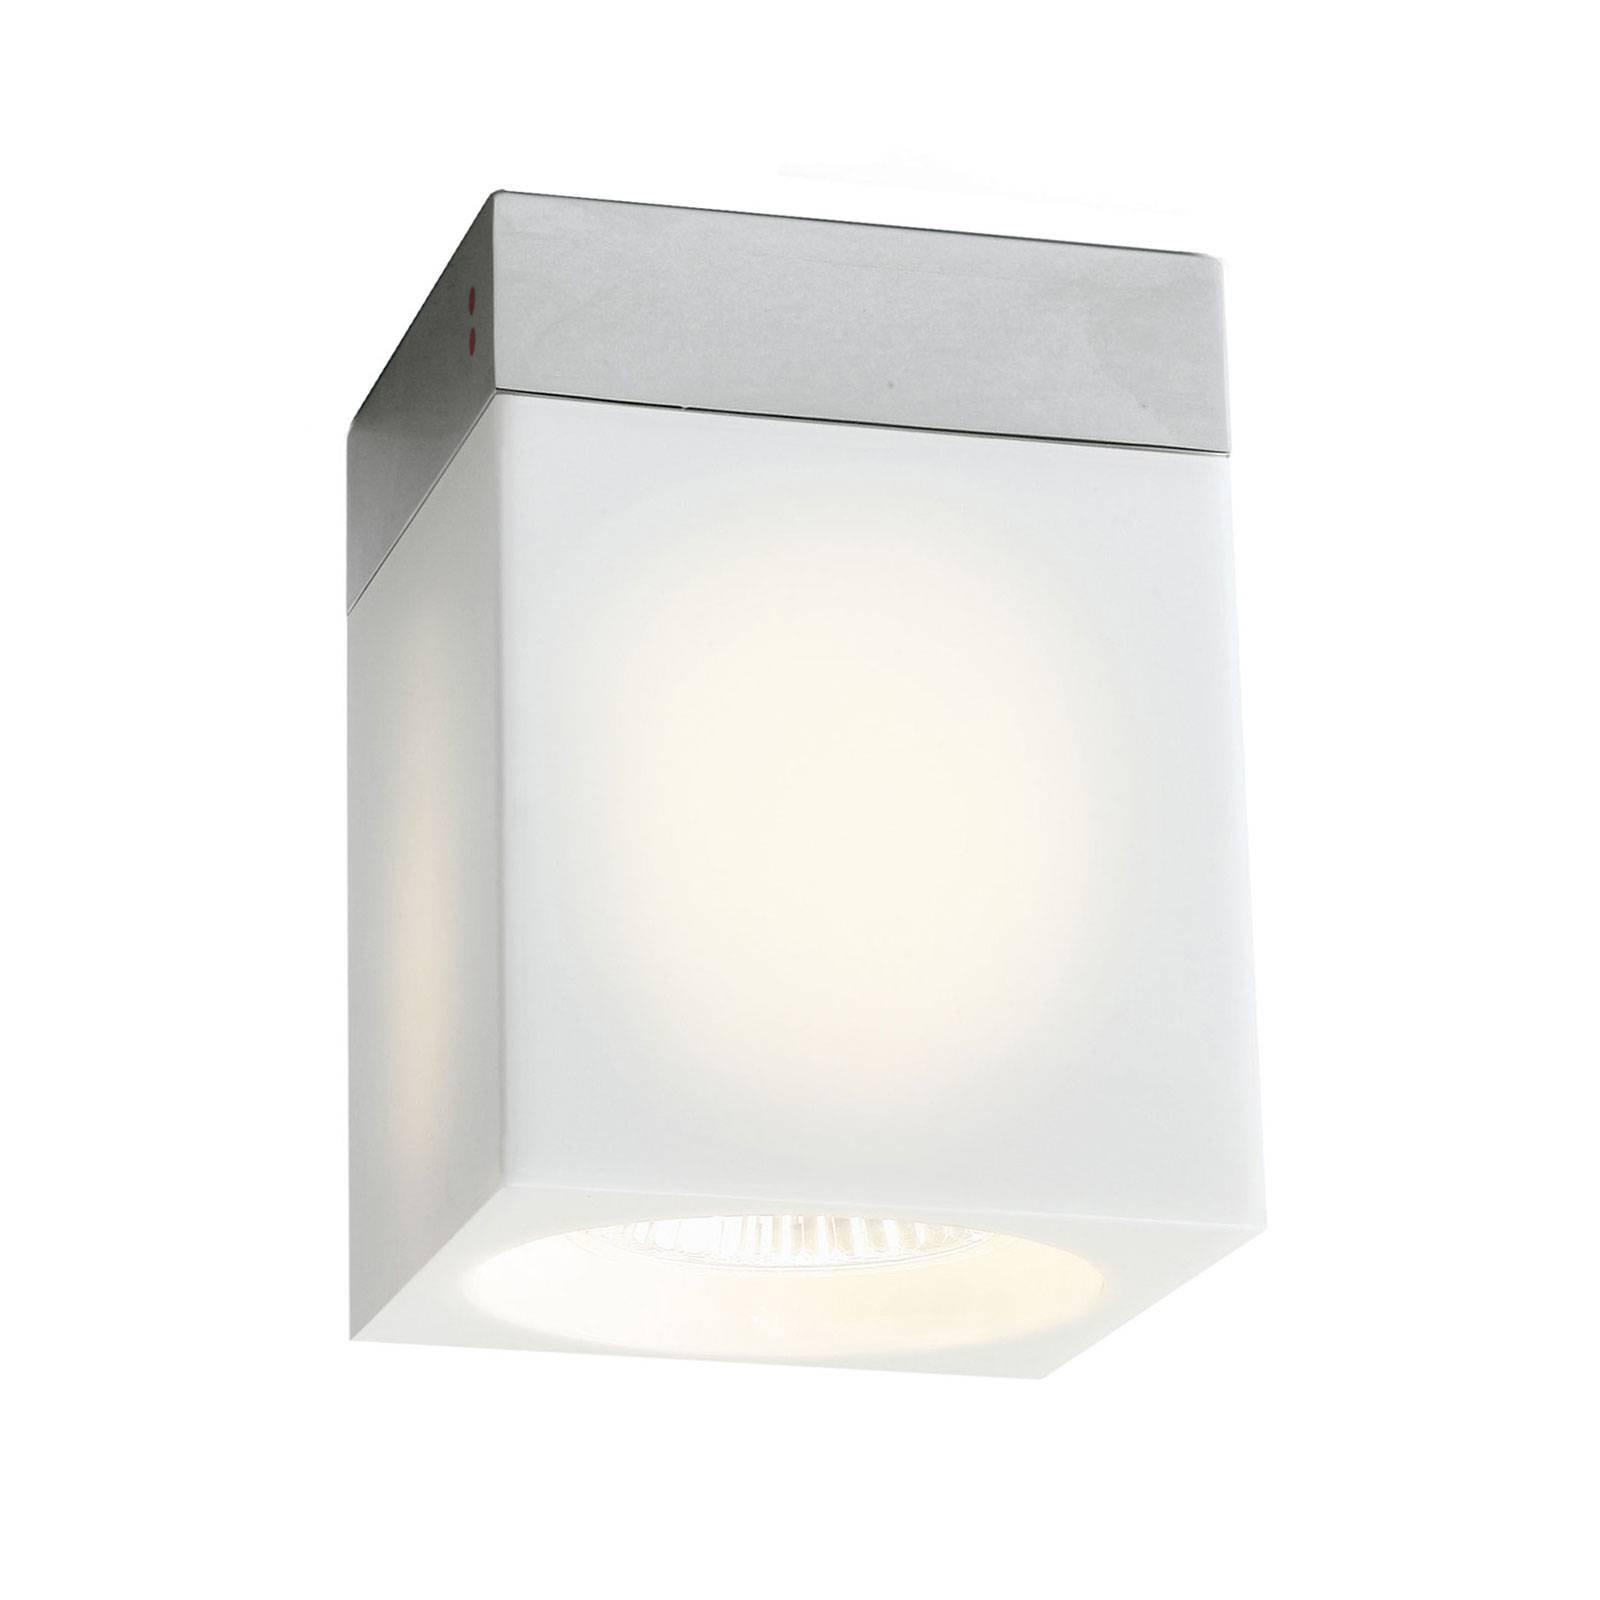 Cubetto taklampe 1lyskilde, hvit